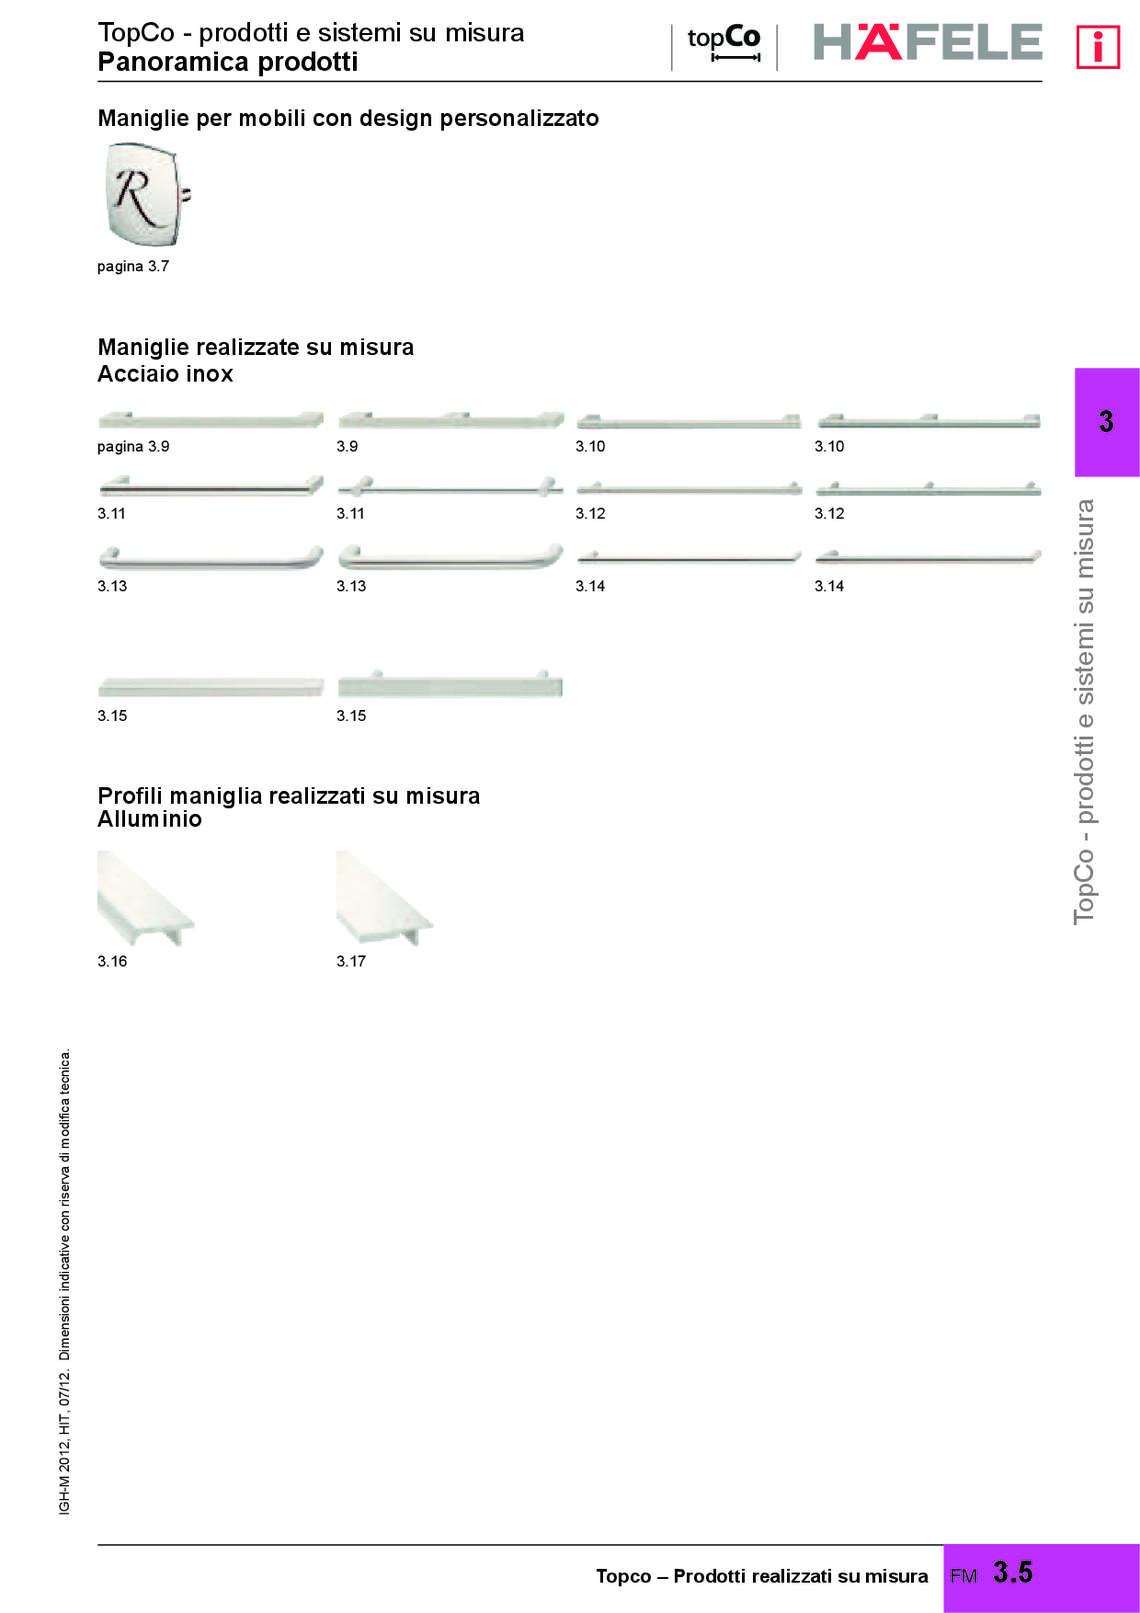 hafele-prodotti-su-misura_81_014.jpg